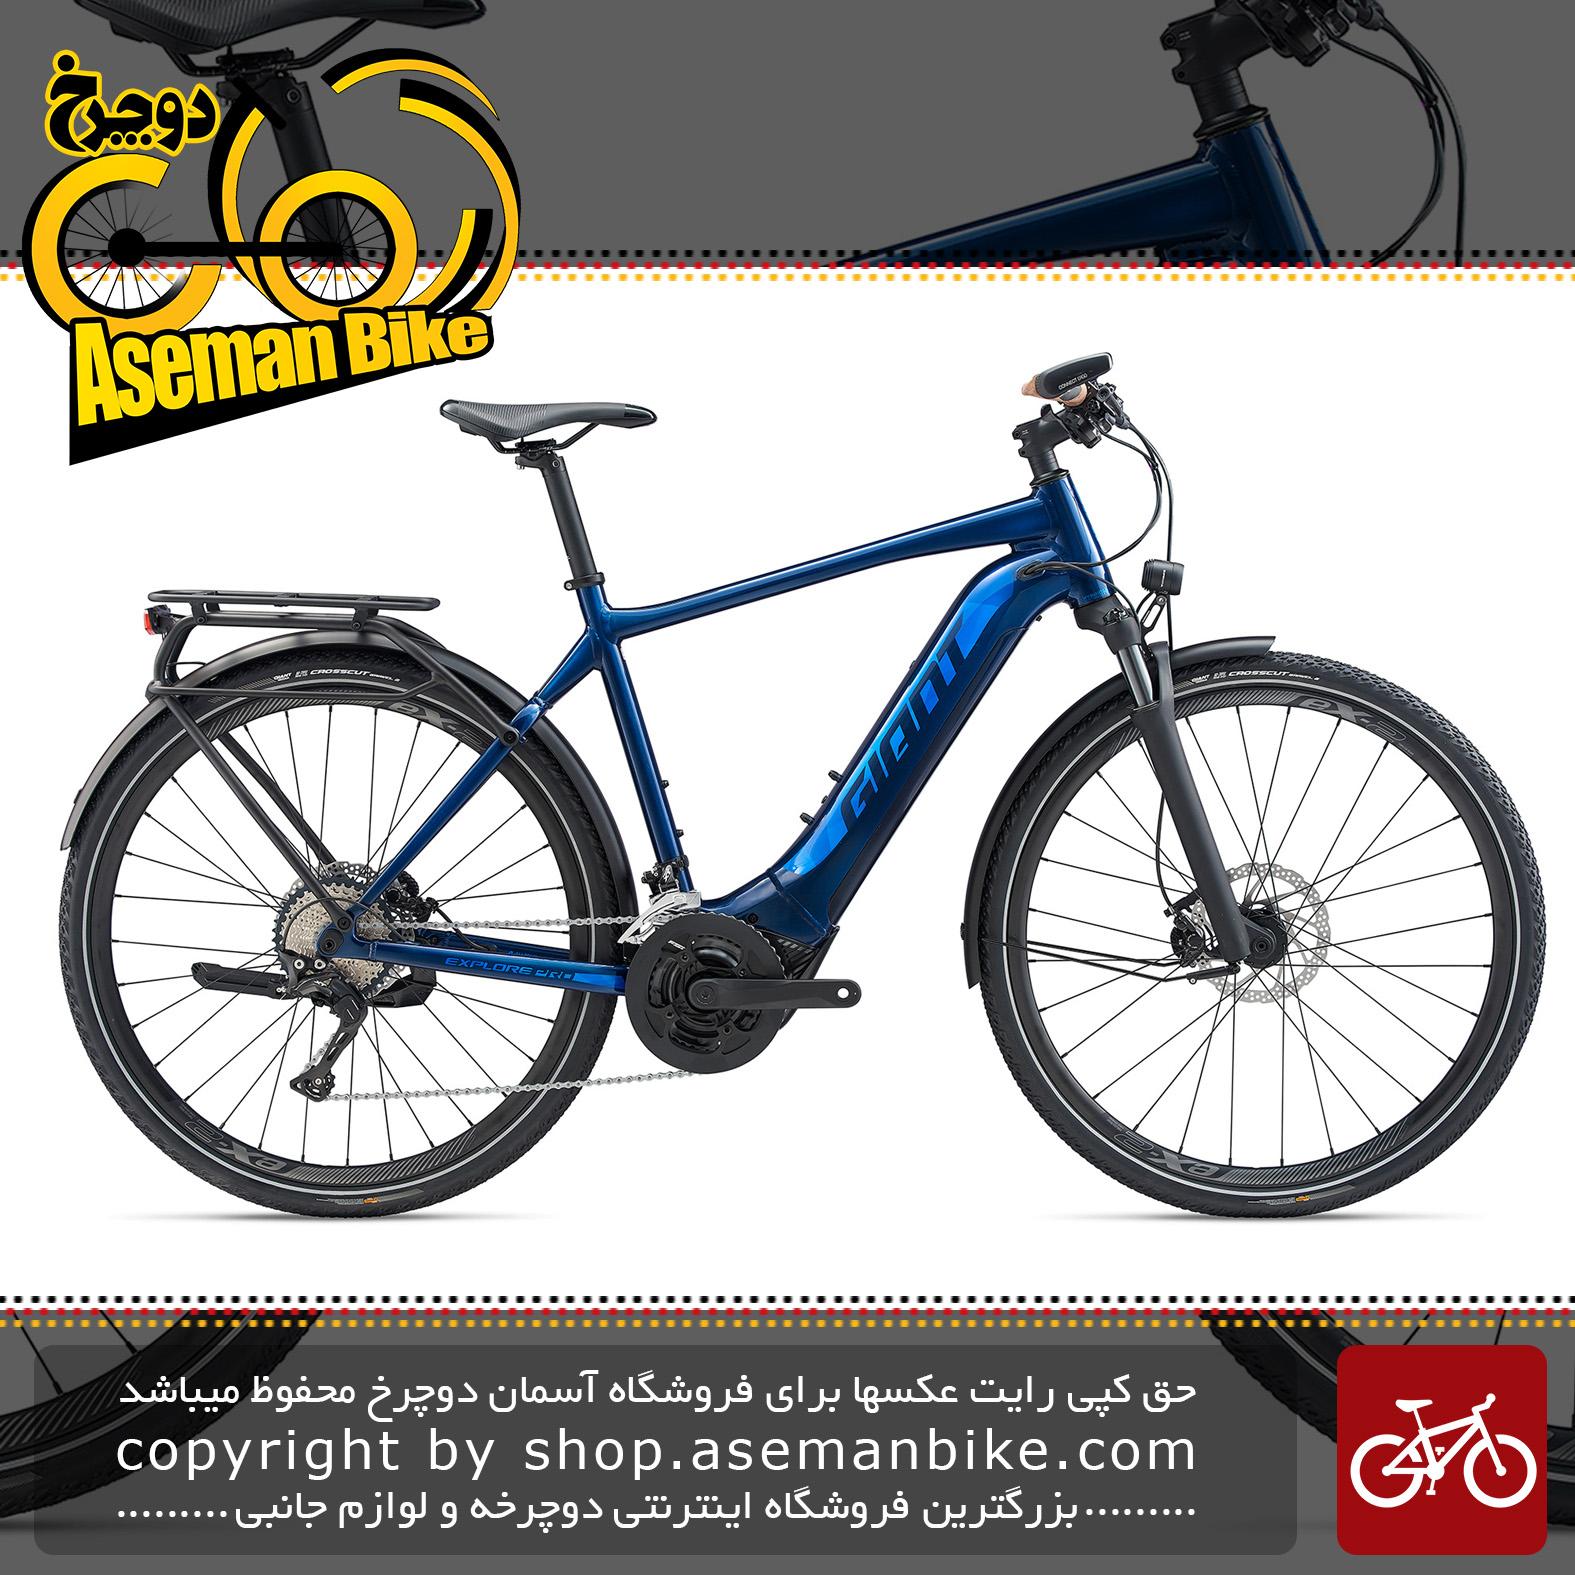 دوچرخه دومنظوره برقی جاینت مدل اکسپلور ای پلاس 0 پرو جی تی اس 2020 Giant Trekking Bicycle Explore E+ 0 GTS 2020